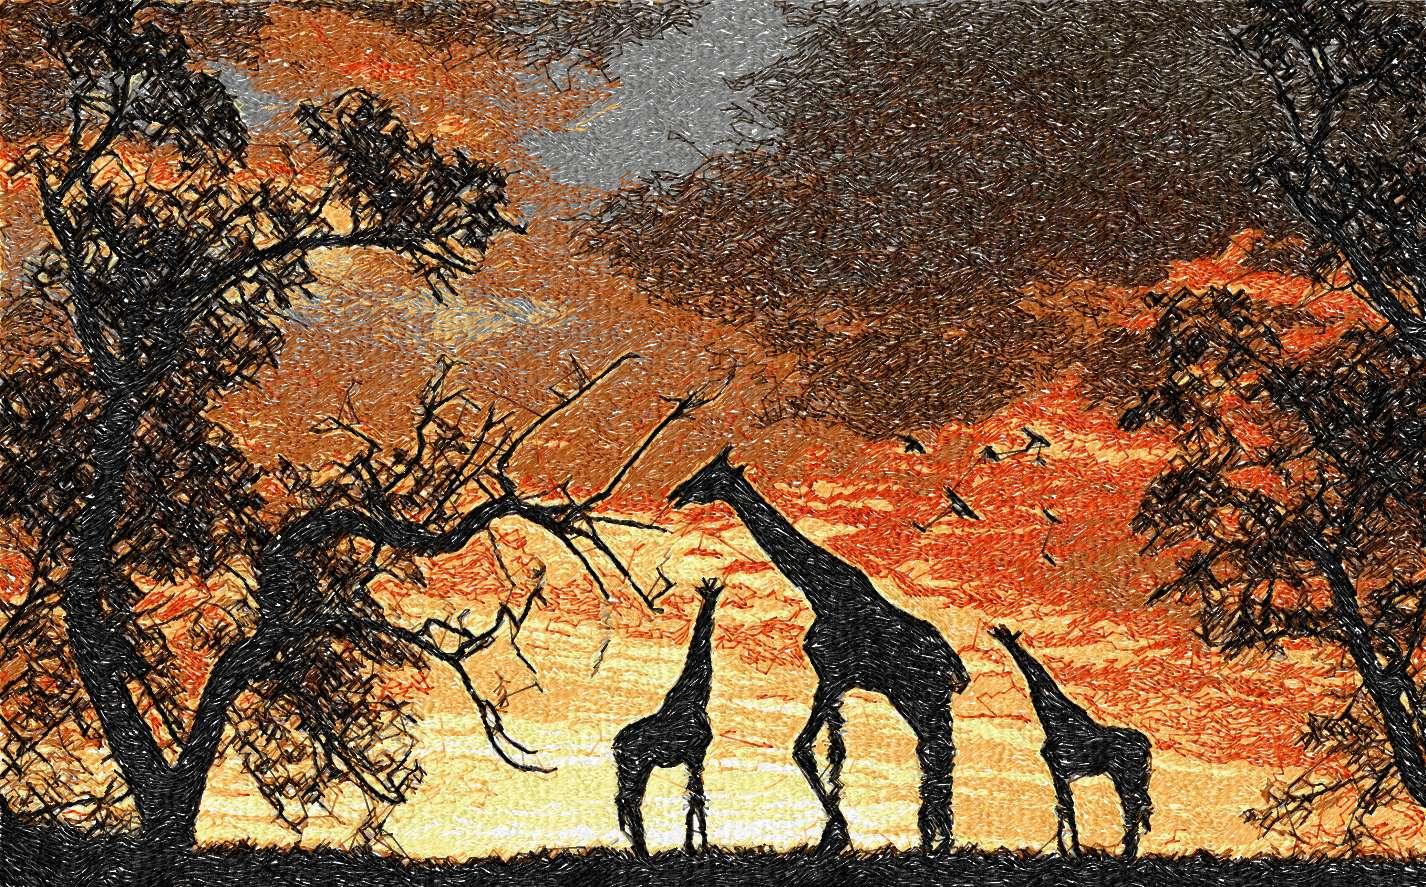 Africa sunset photo stitch free embroidery design 2